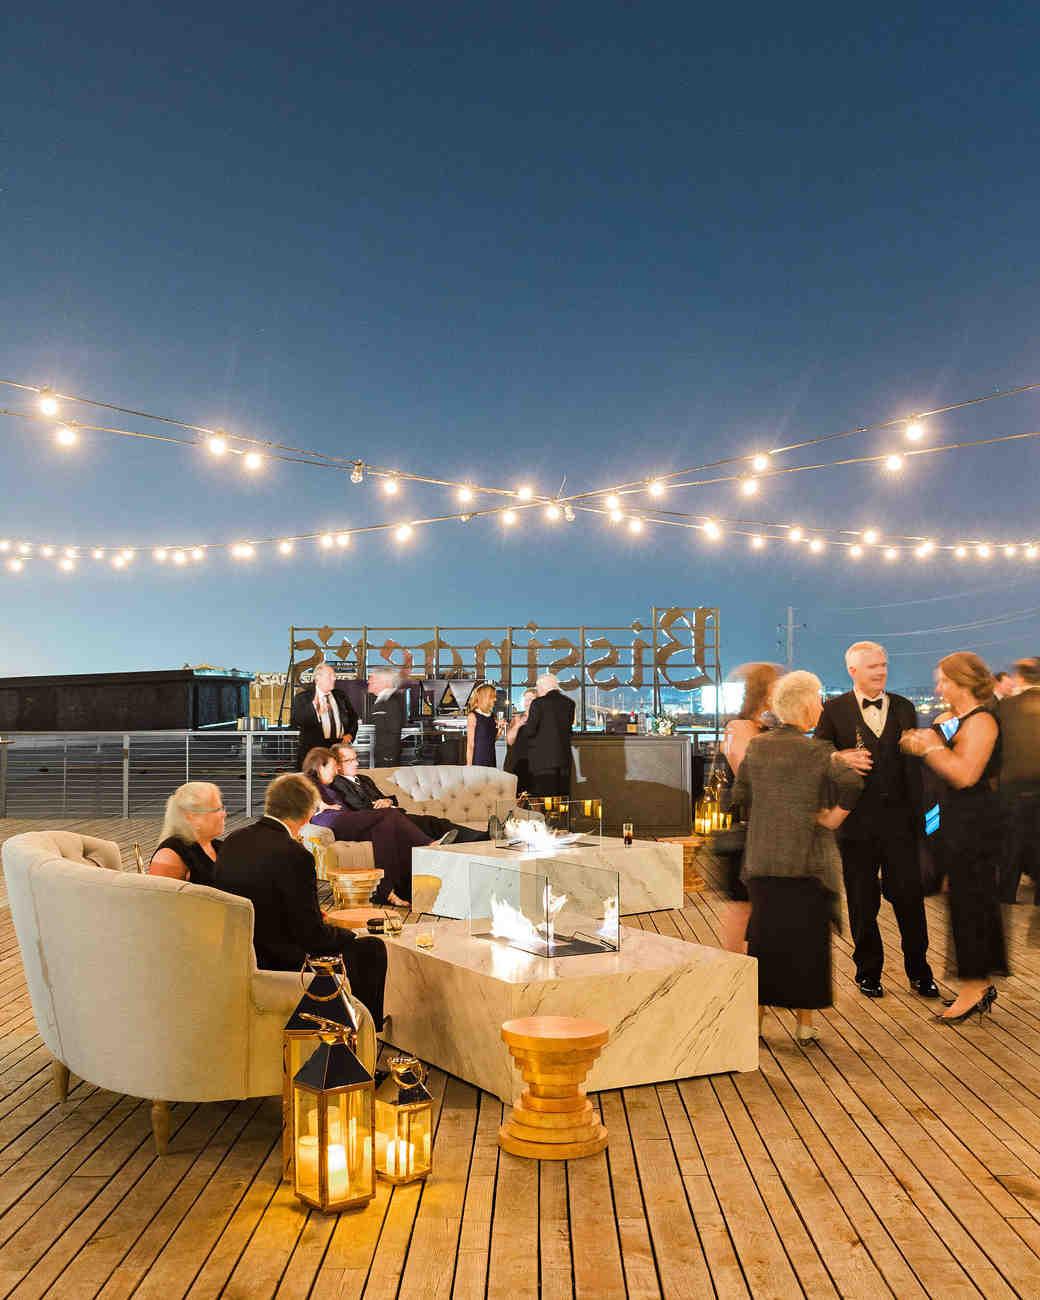 chrissy-jon-wedding-missouri-rooftop-cocktails102882030_vert.jpg